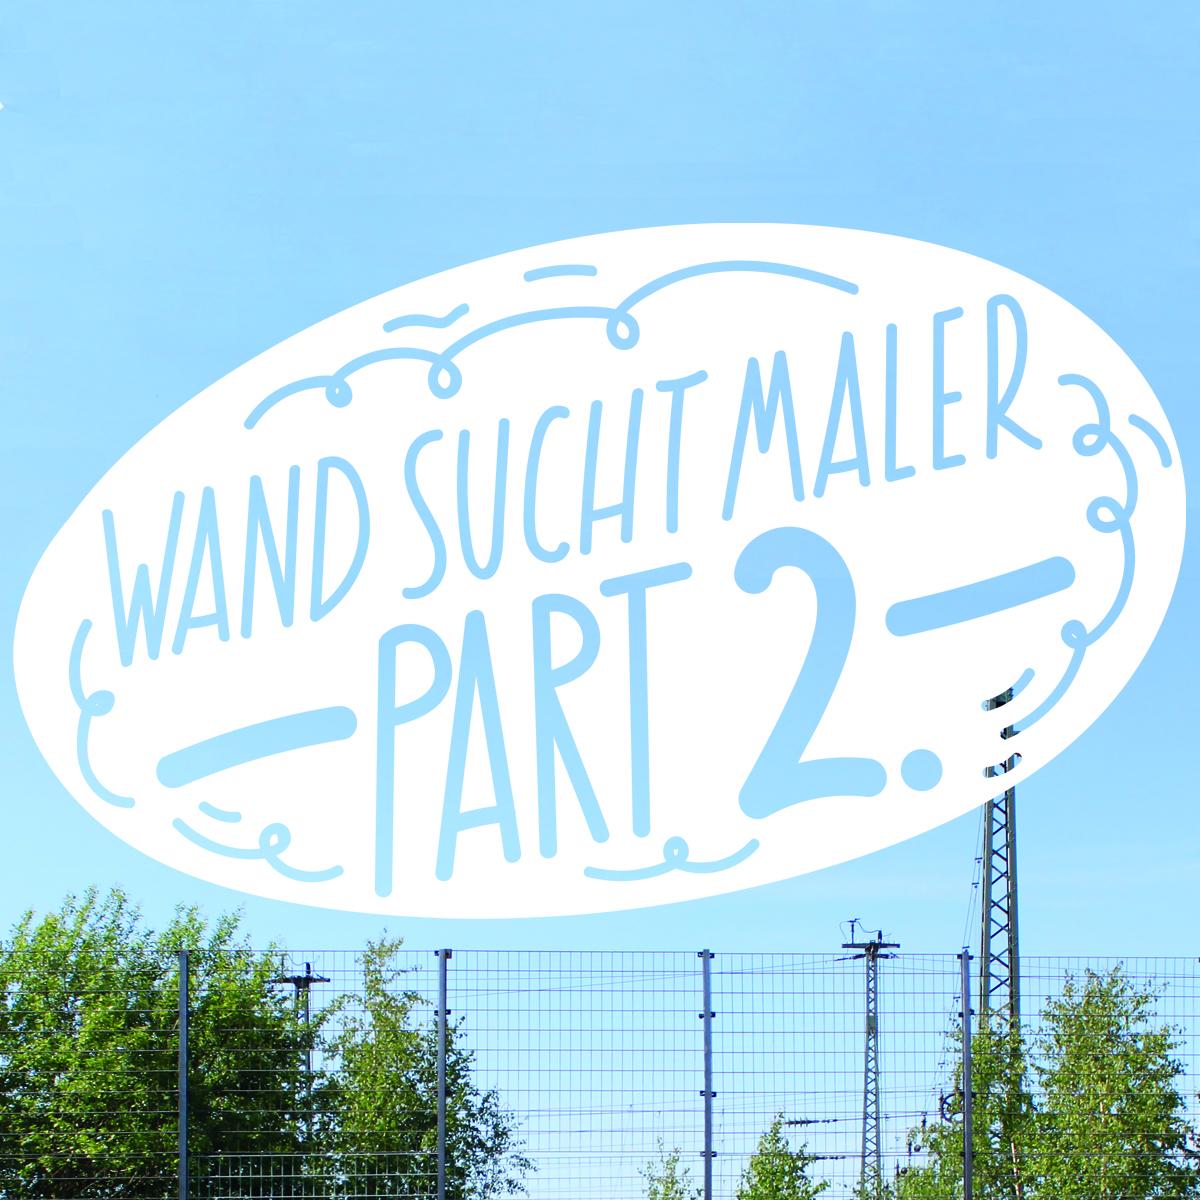 Wand sucht Maler pt. 2 - Workshops